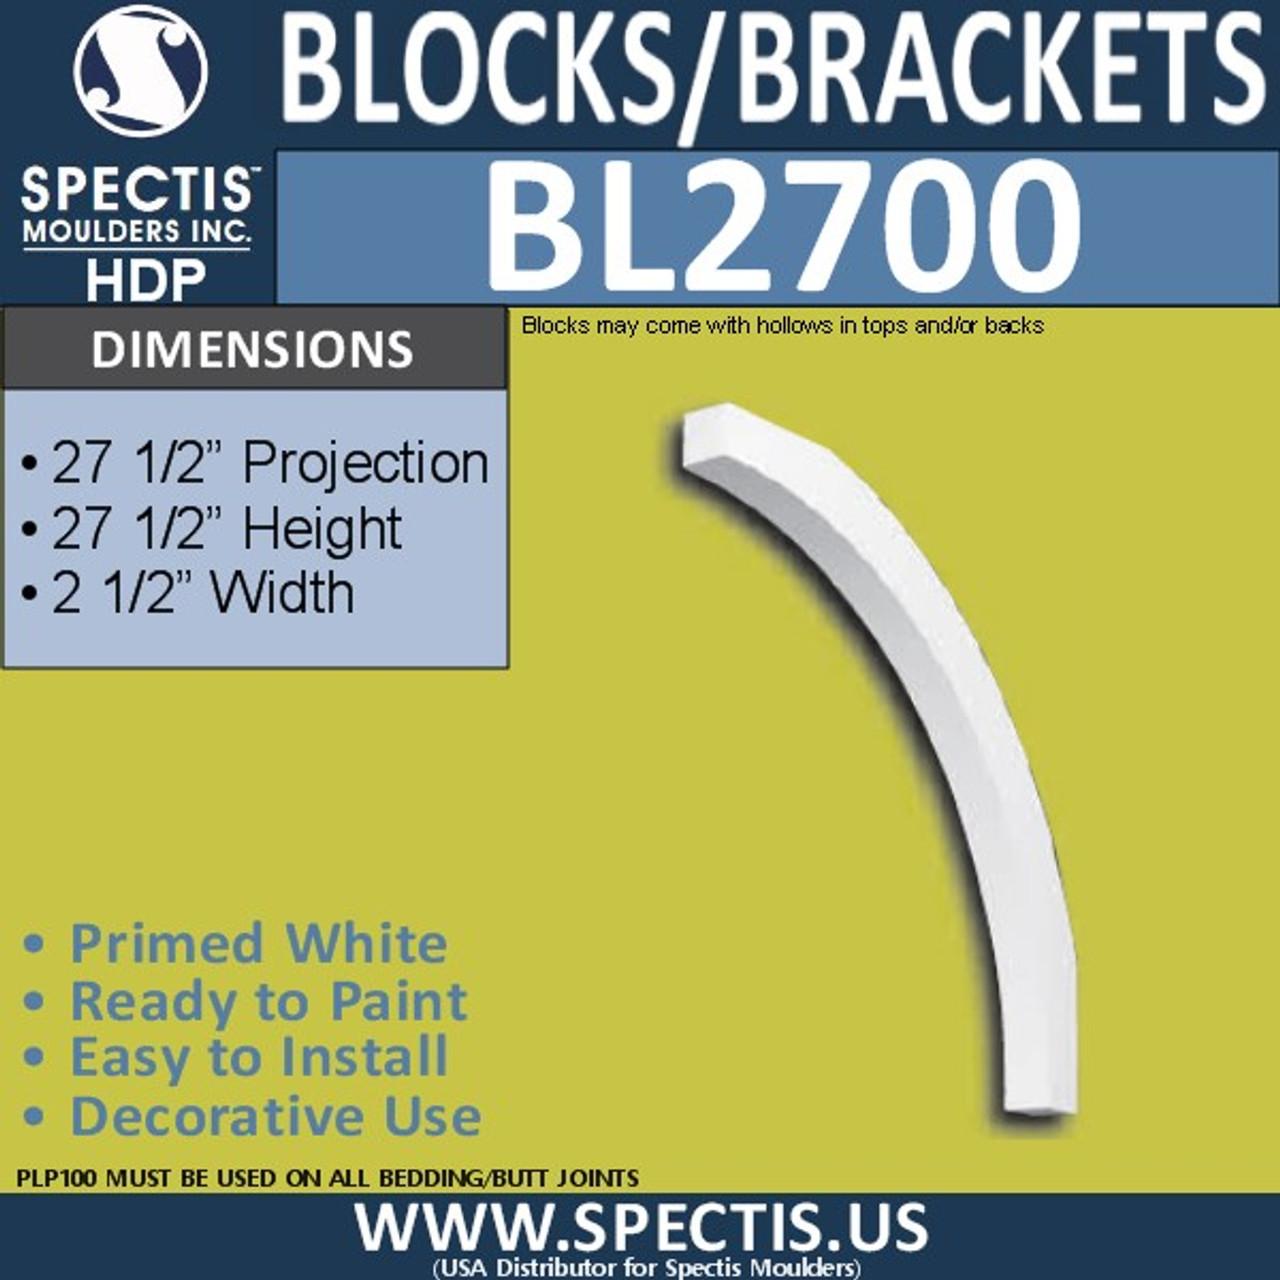 "BL2700 Eave Block or Bracket 2.5""W x 27.5""H x 27.5"" P"